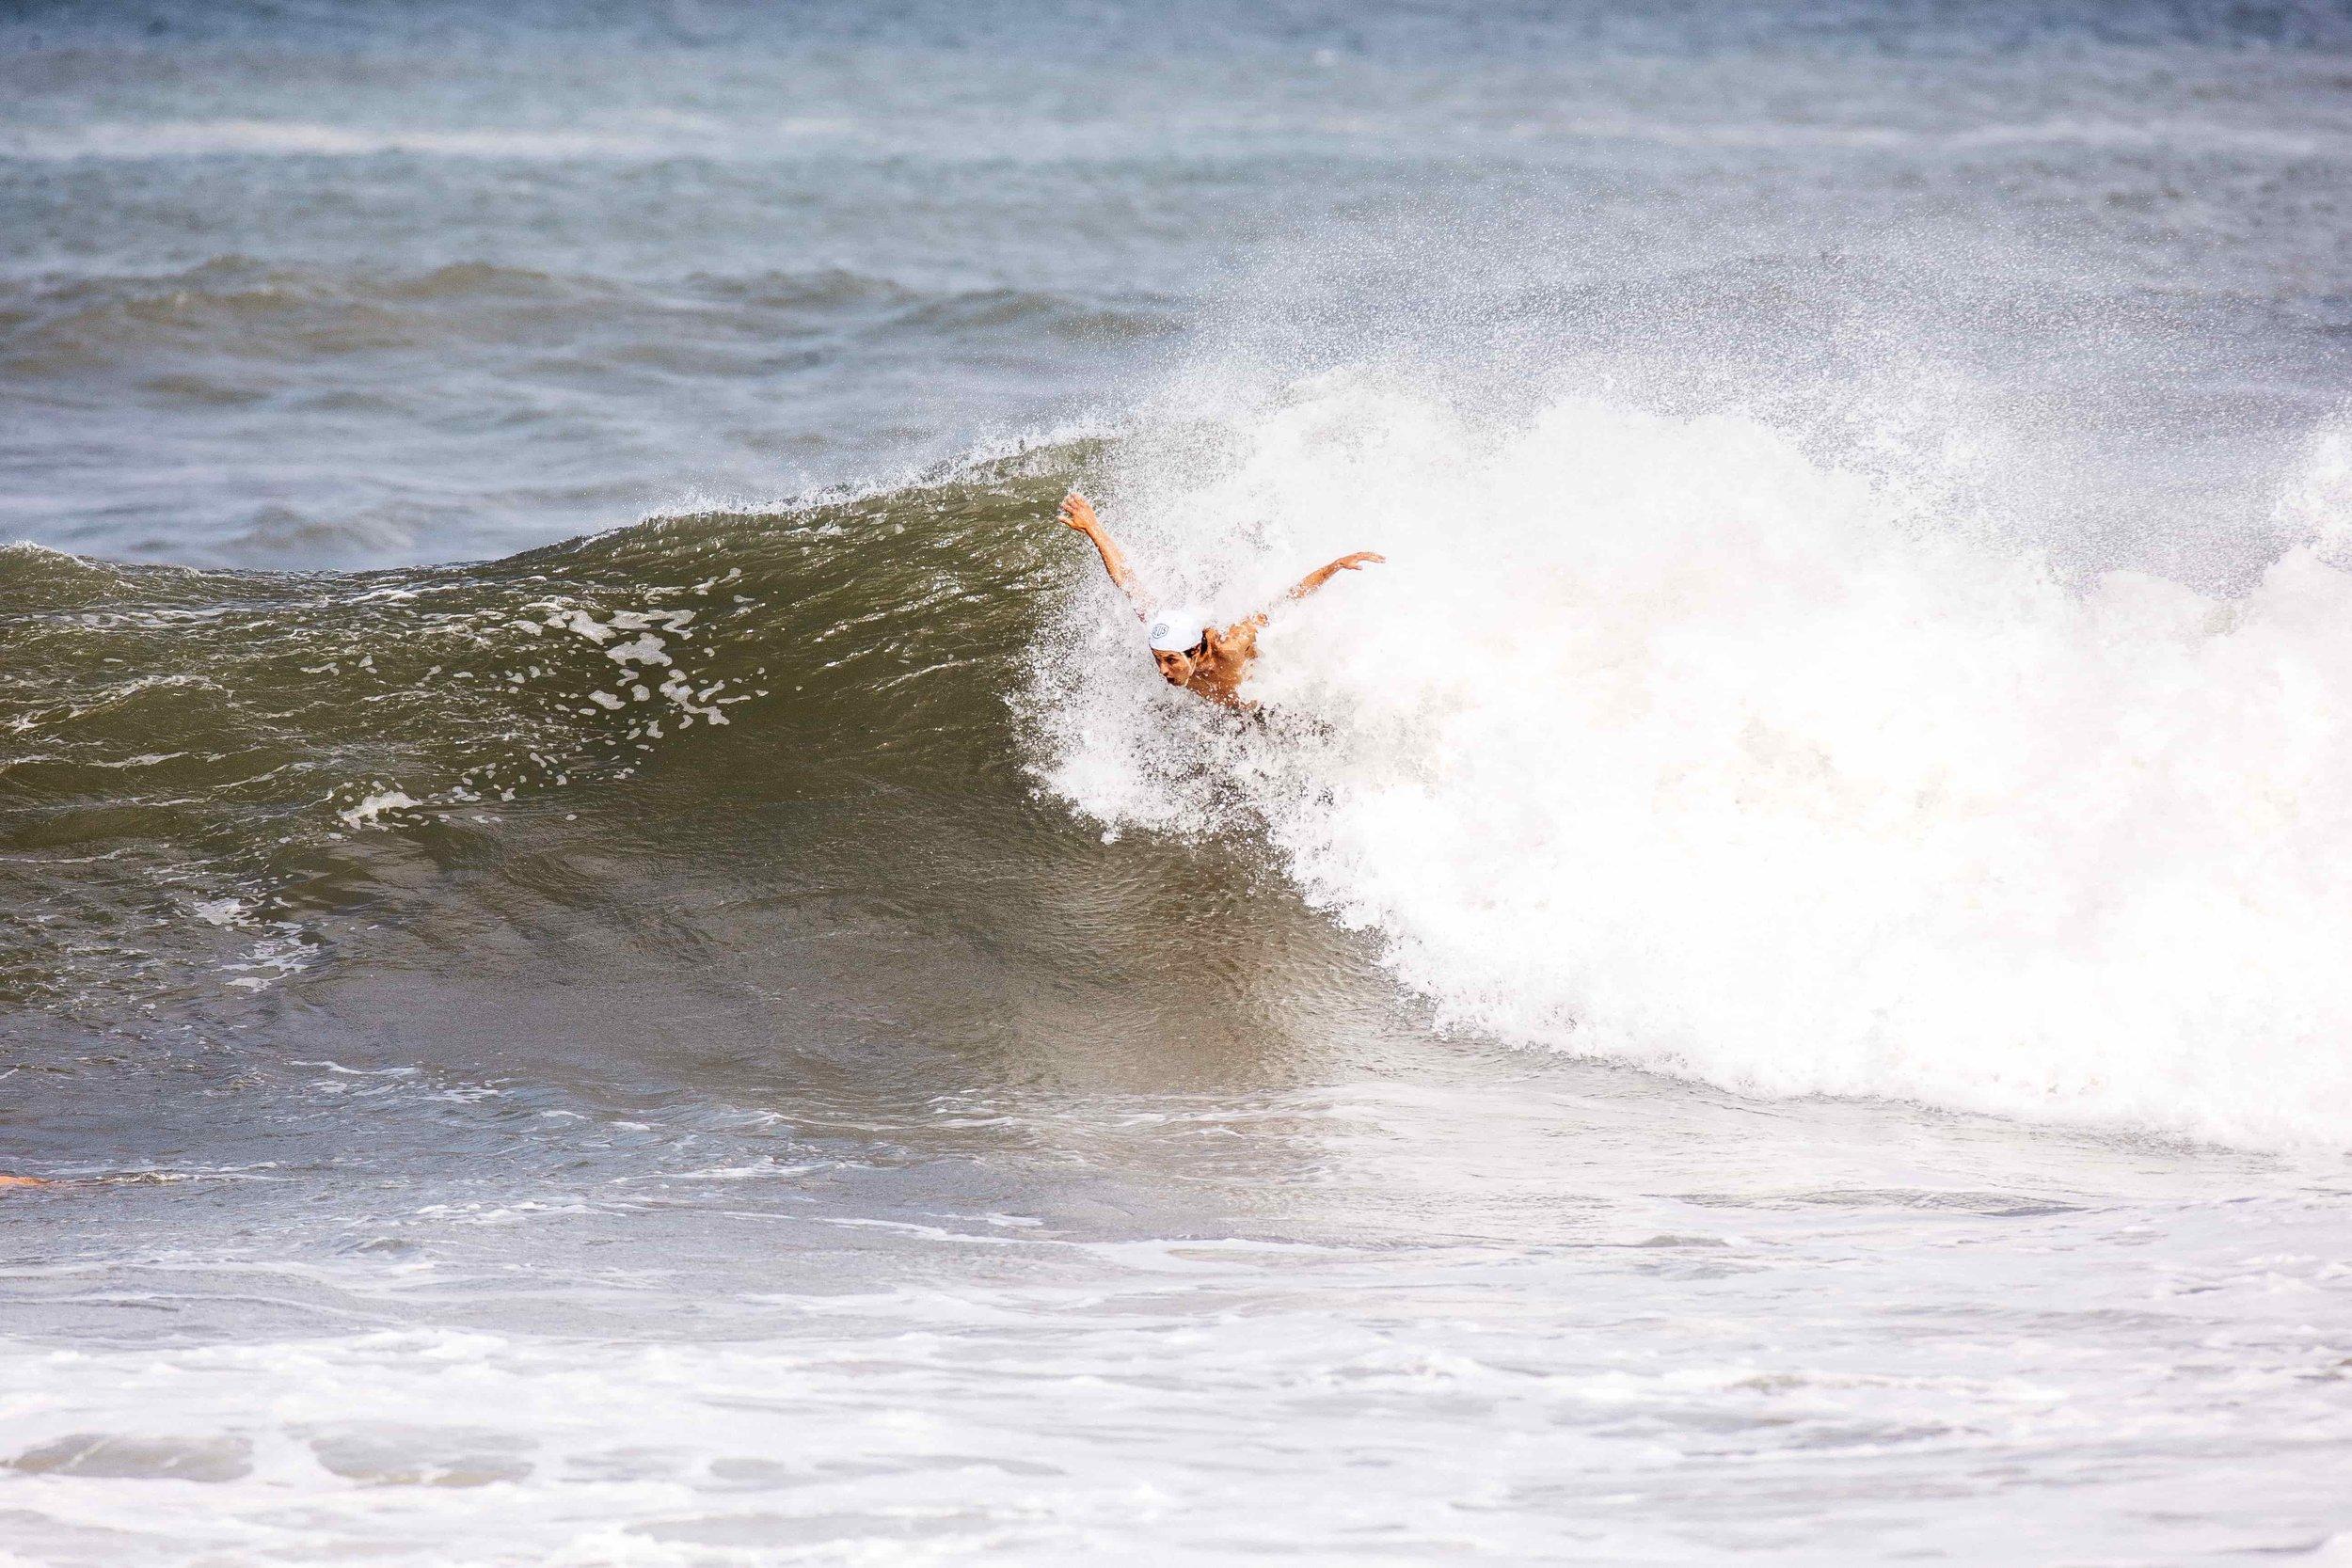 Jack Macrae body surfer